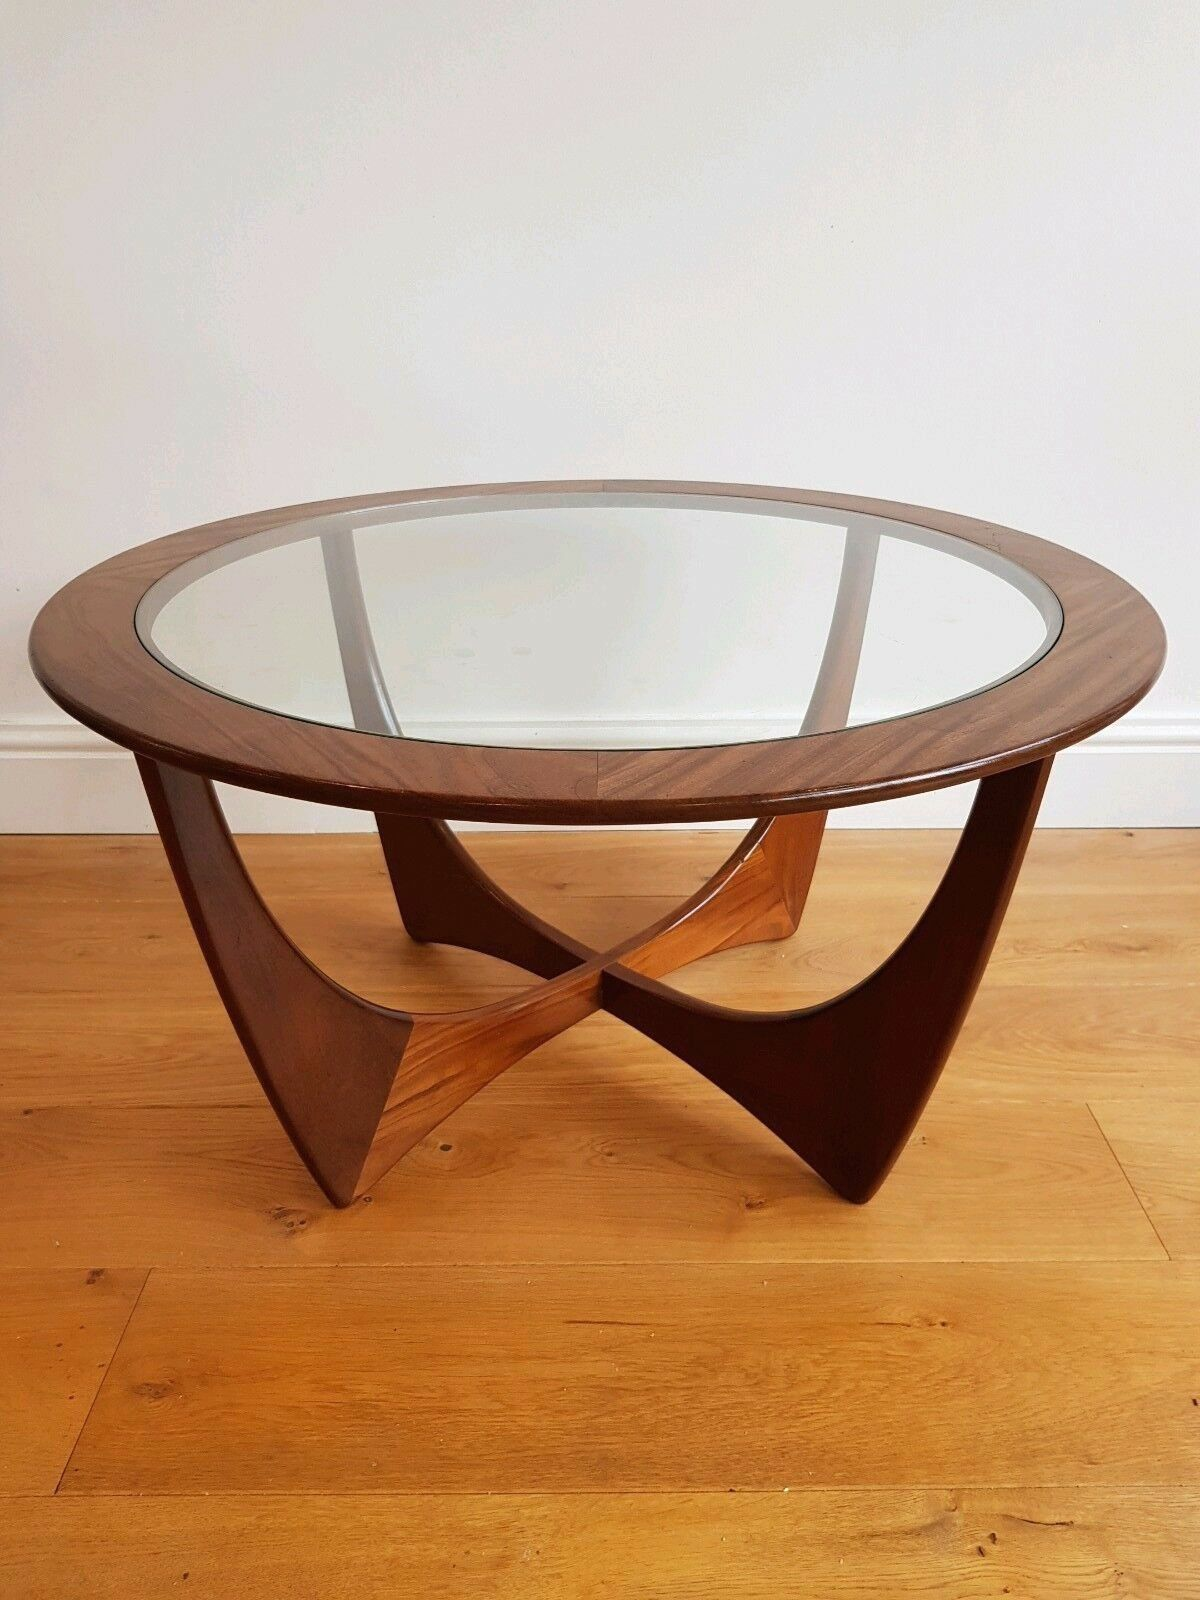 Vintage Retro Mid Century G Plan Astro Coffee Table 1000 Mid Century Coffee Table Retro Coffee Tables Mid Century Glass Coffee Table [ 1600 x 1200 Pixel ]